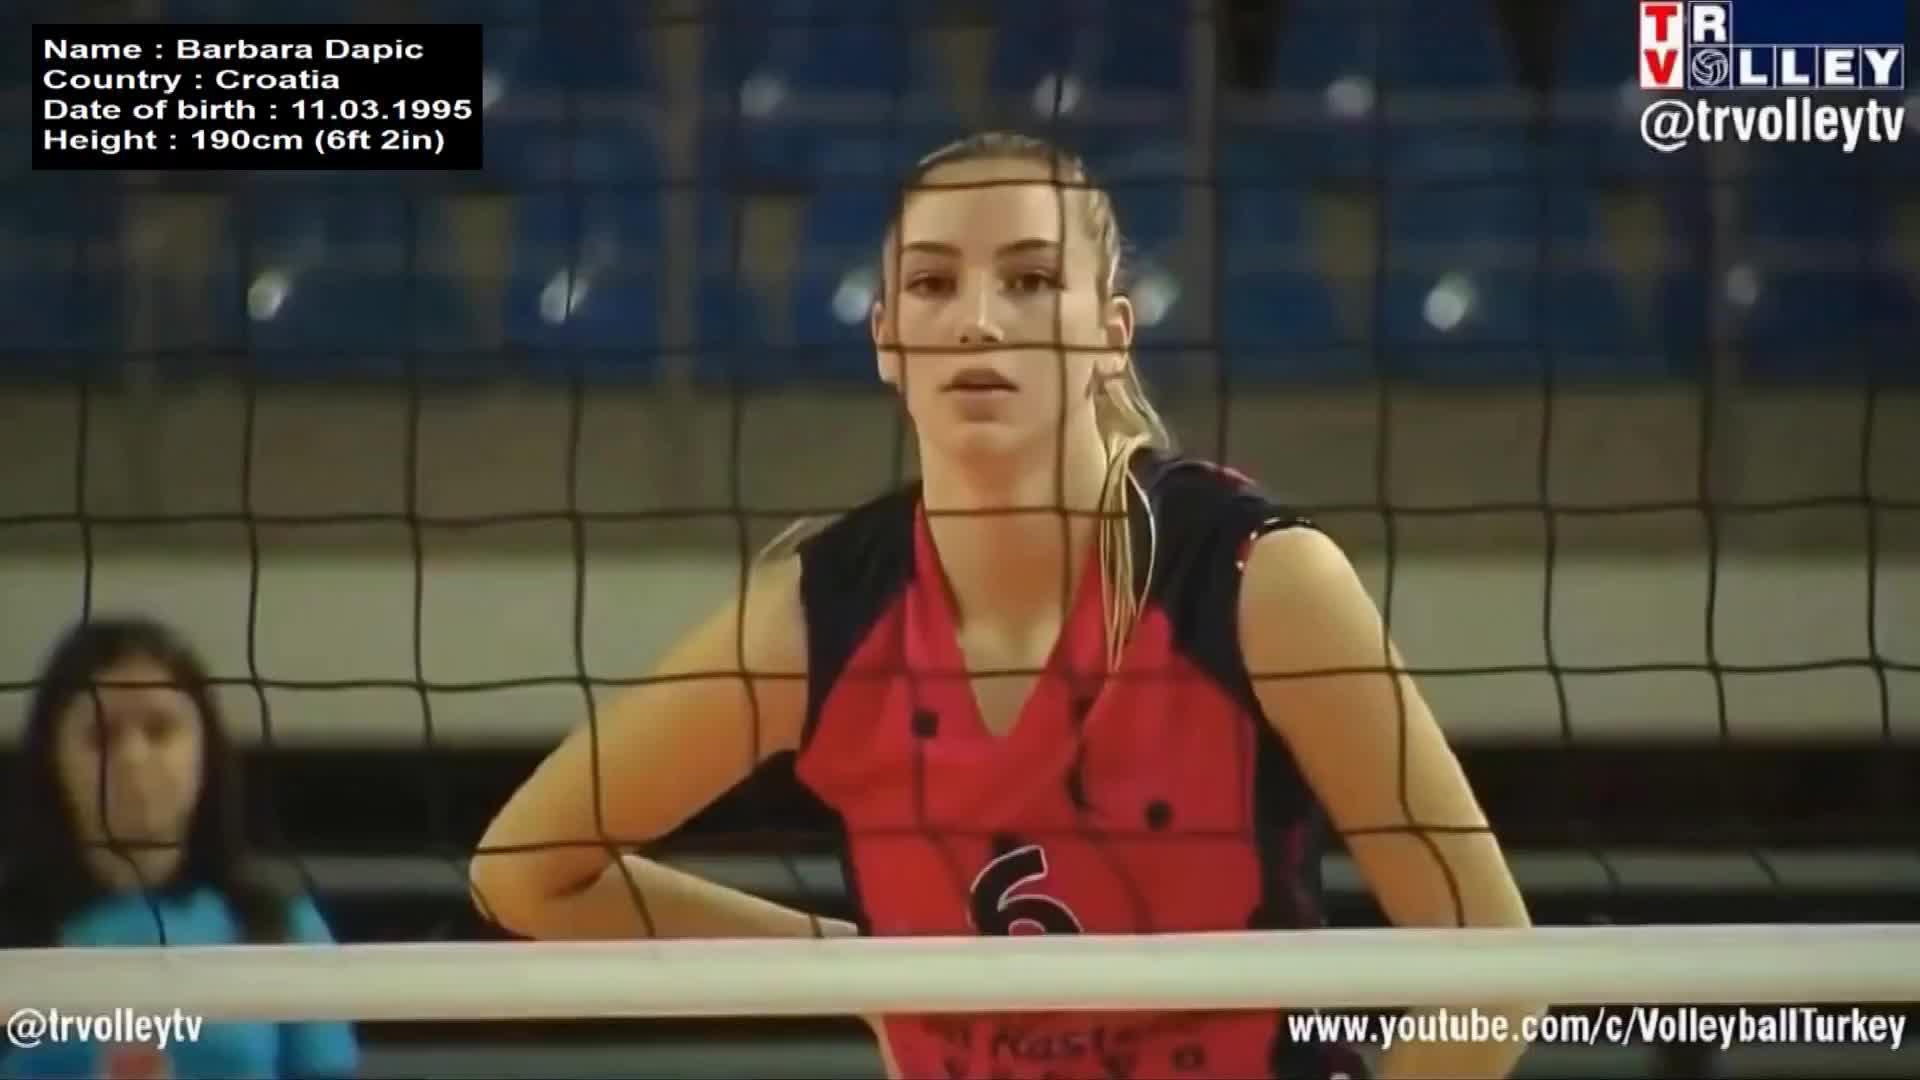 VolleyballGirls, Barbara Dapic GIFs